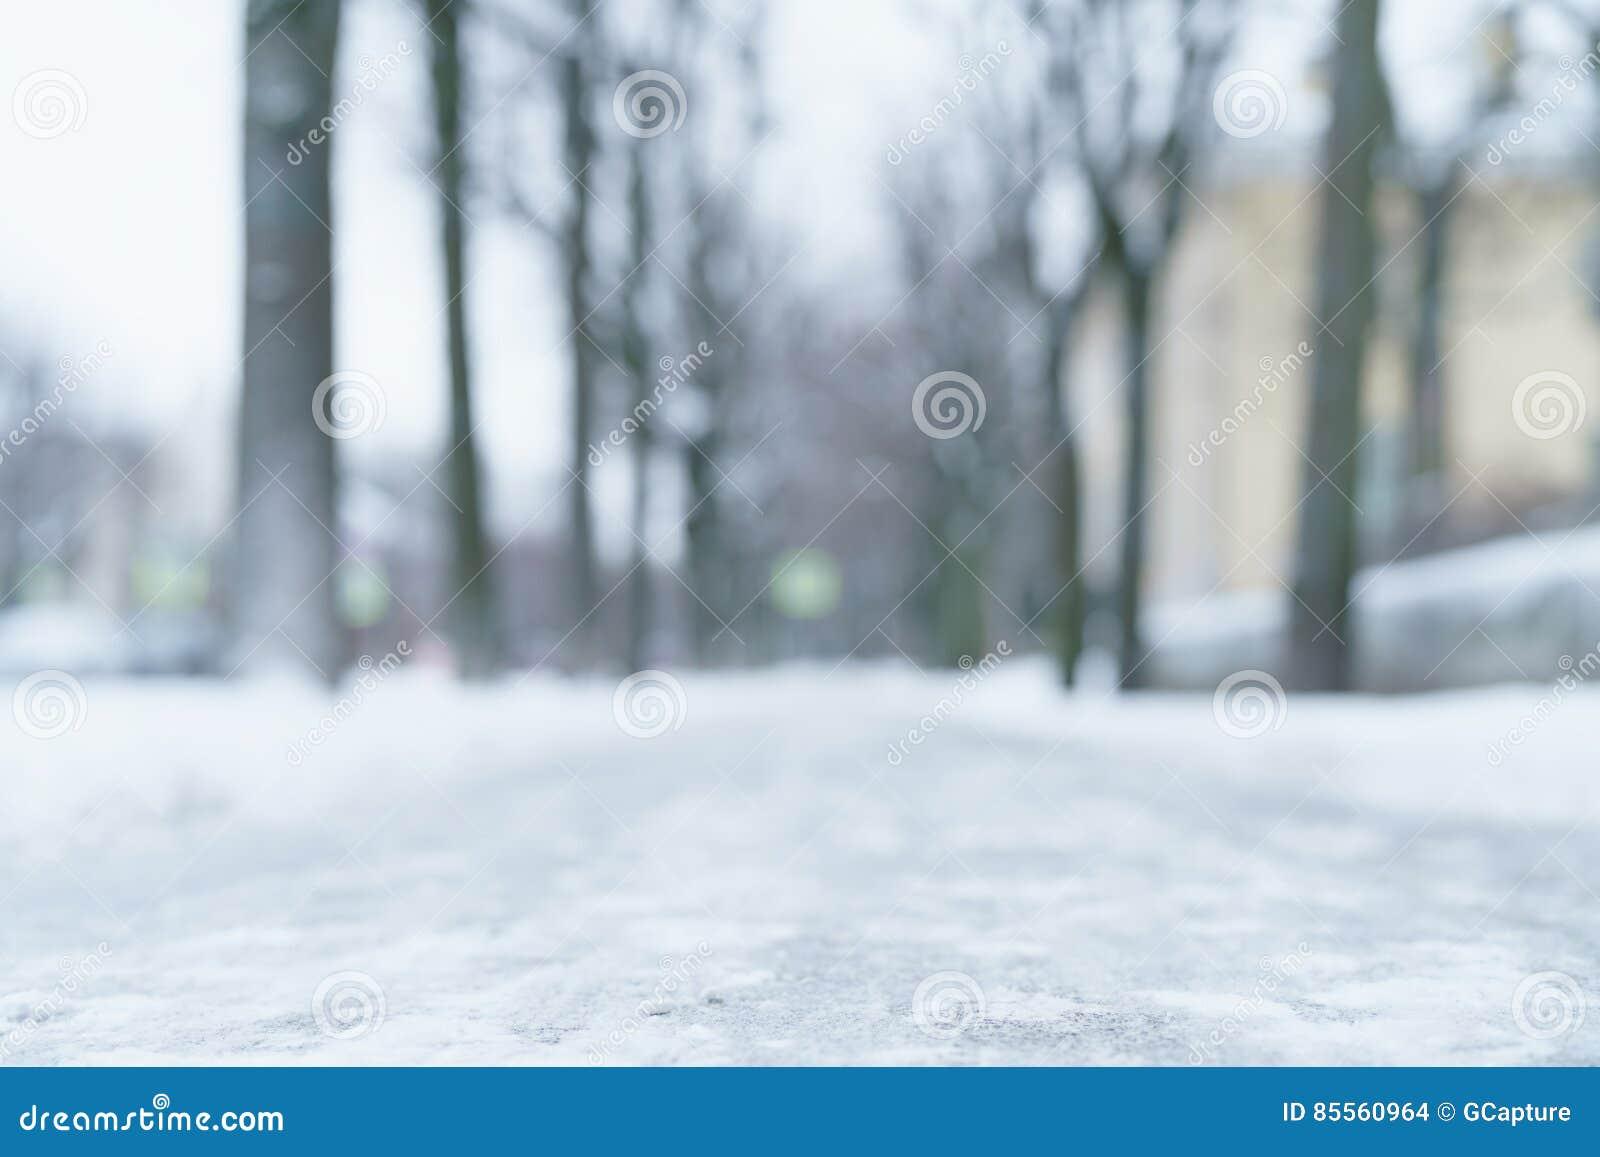 Froschperspektive des Stadtbürgersteigs im Winter